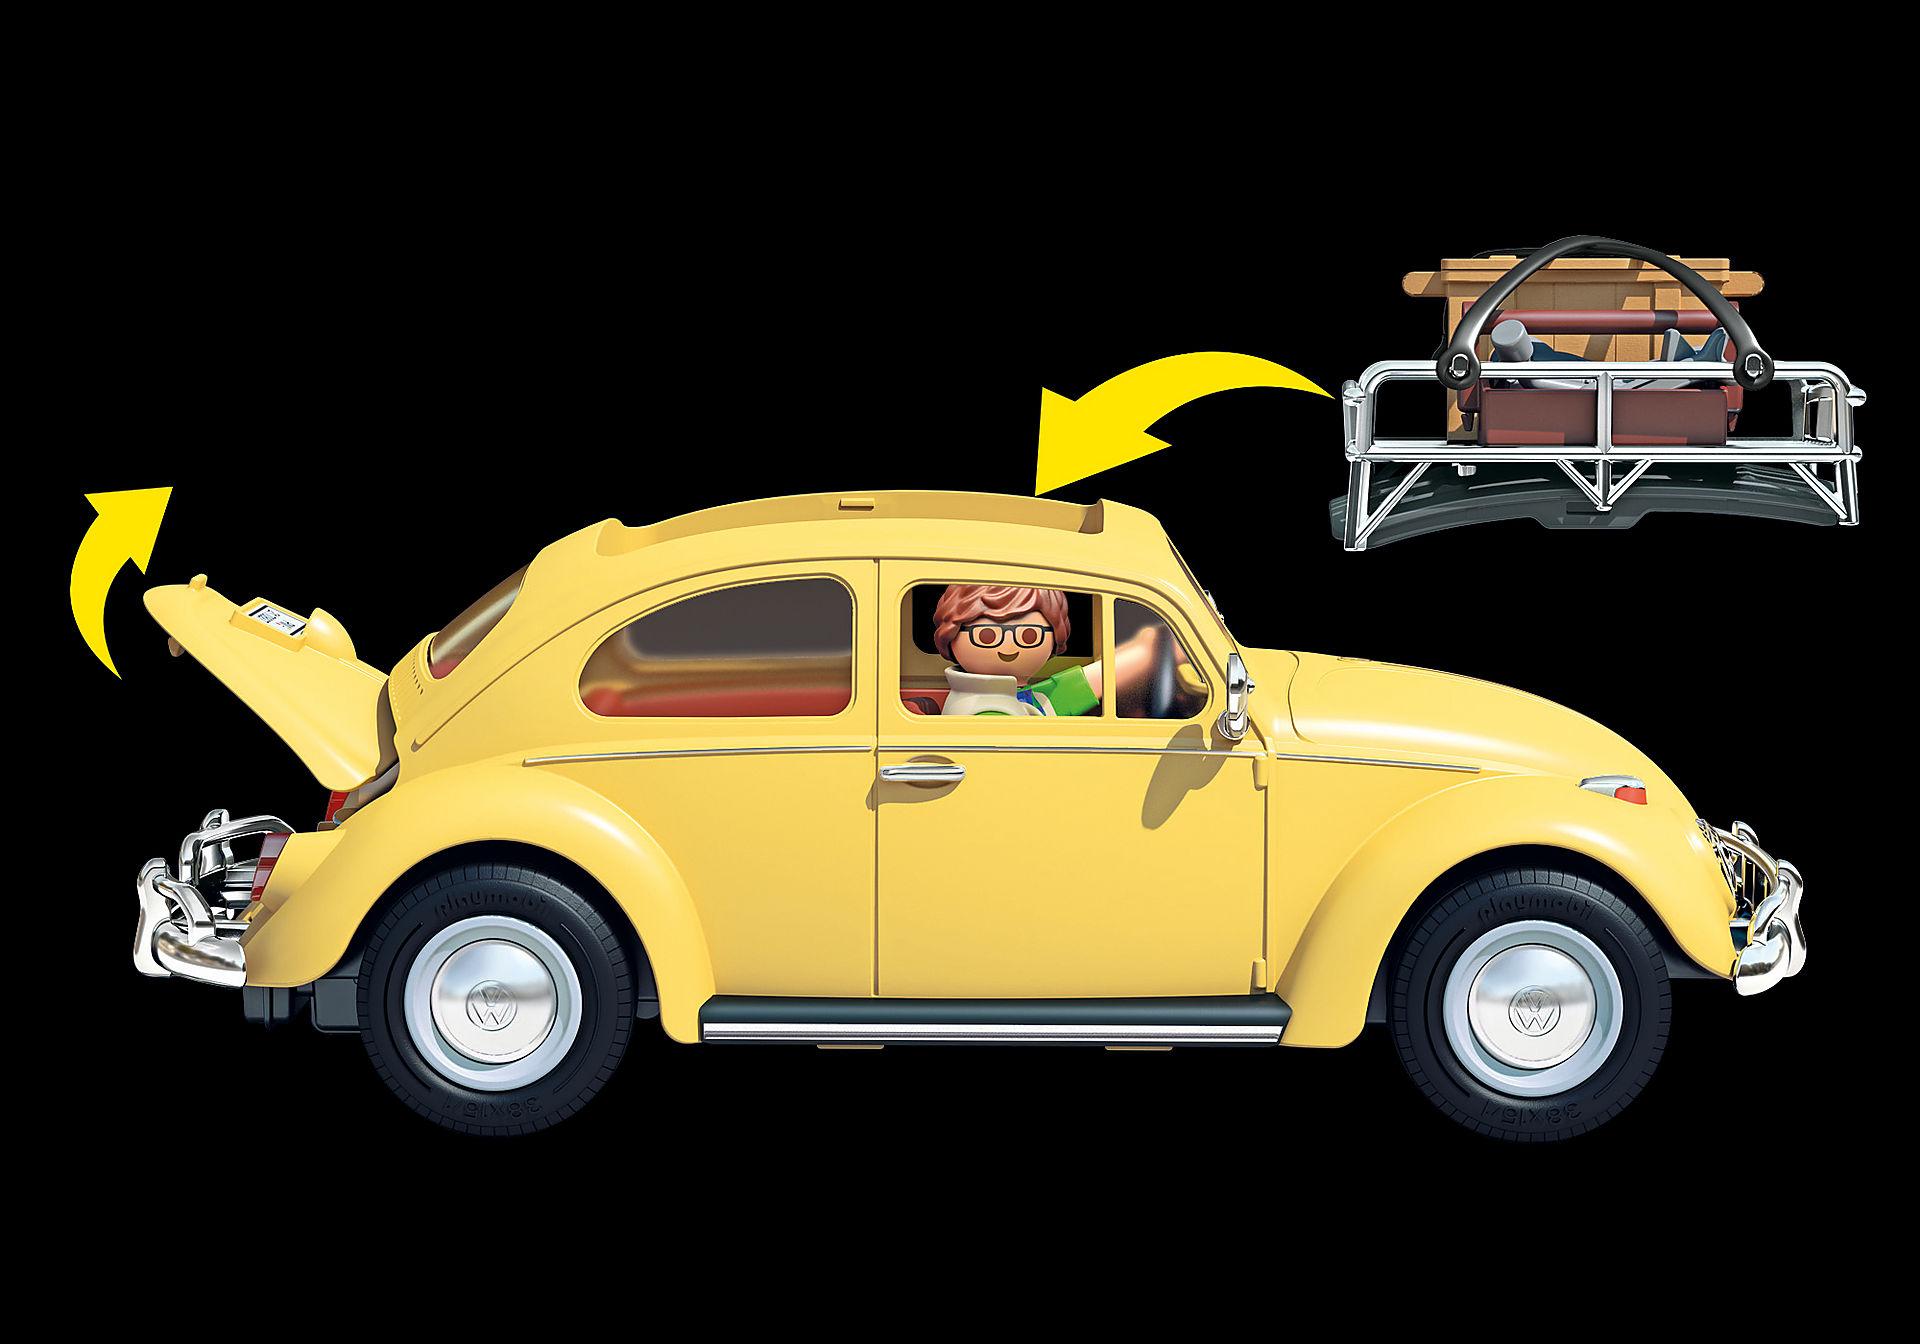 70827 Volkswagen Beetle - Edição especial zoom image5